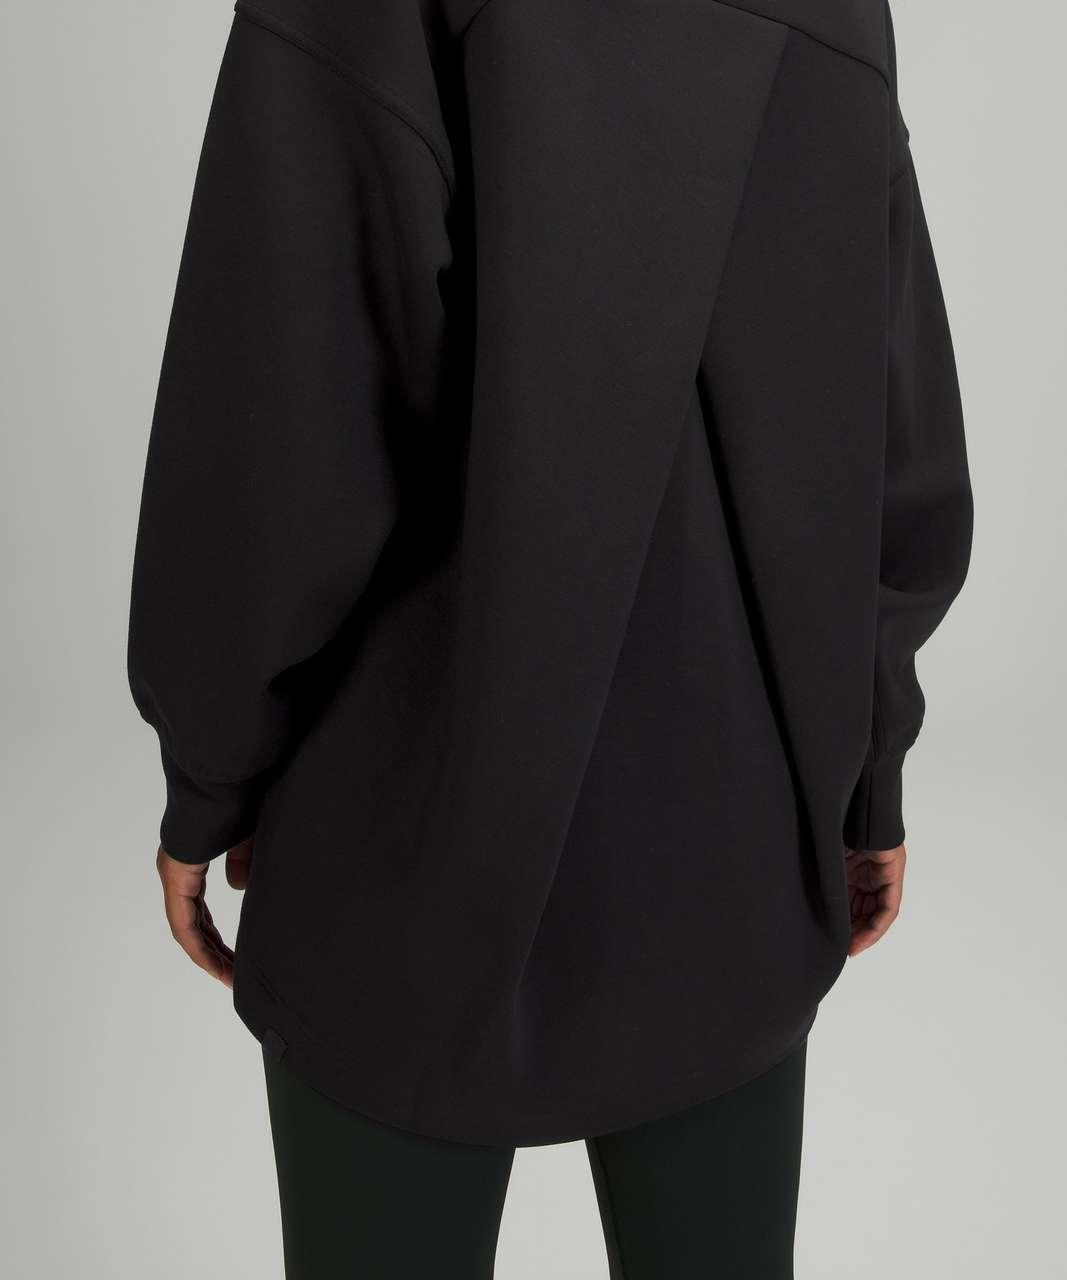 Lululemon Modal-Blend Turtleneck Tunic - Black